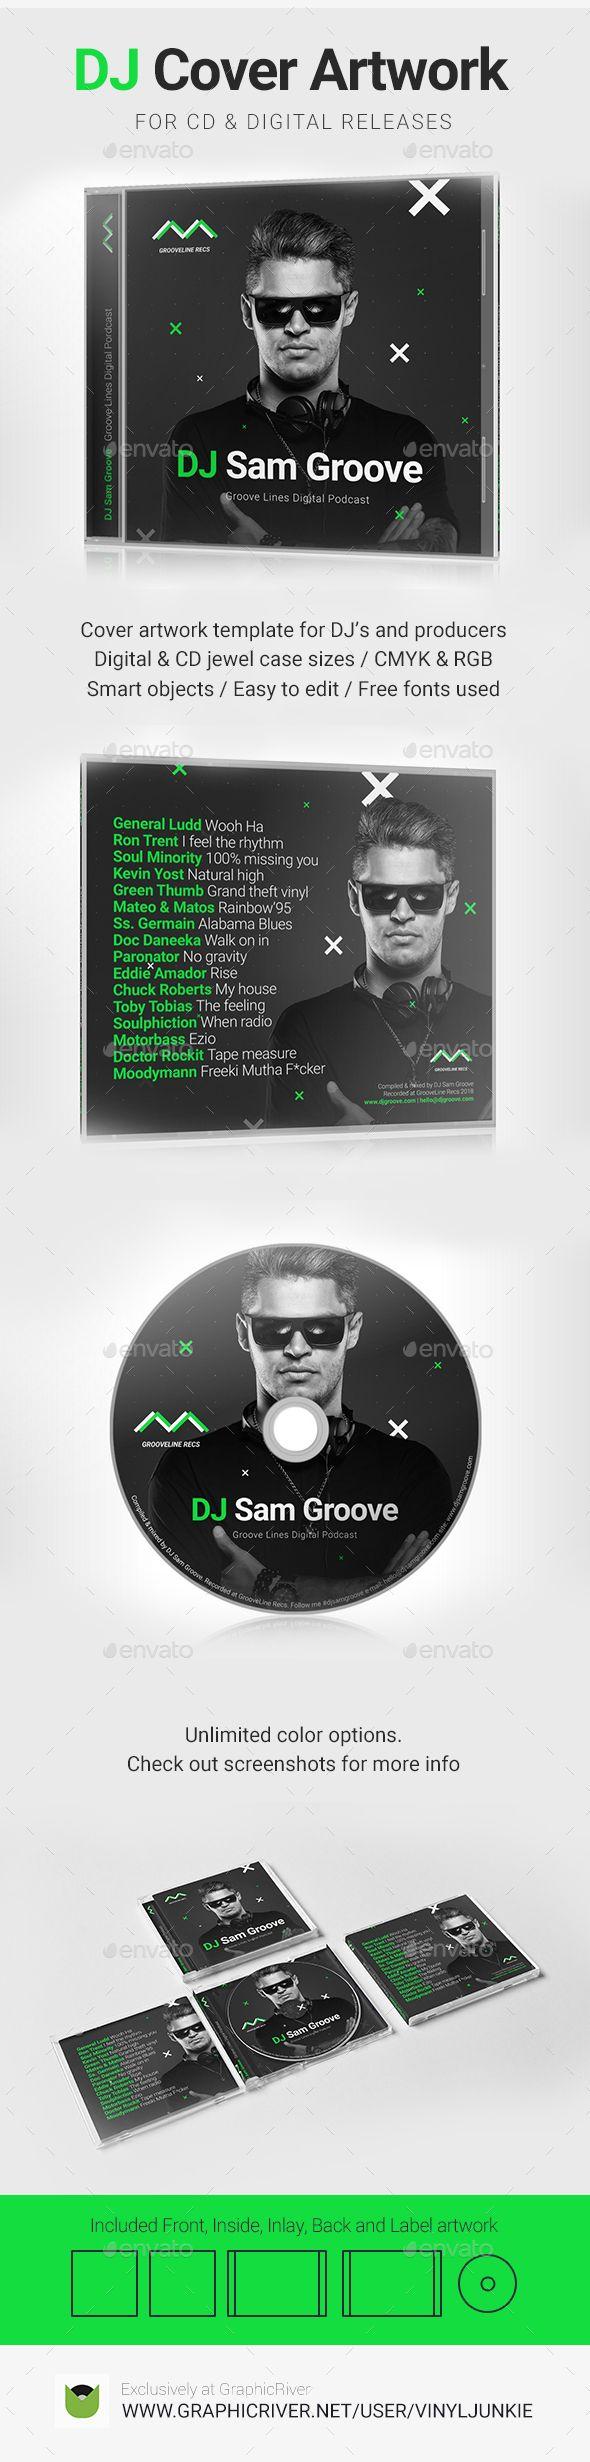 grooveline dj mix album cd cover artwork psd template cd